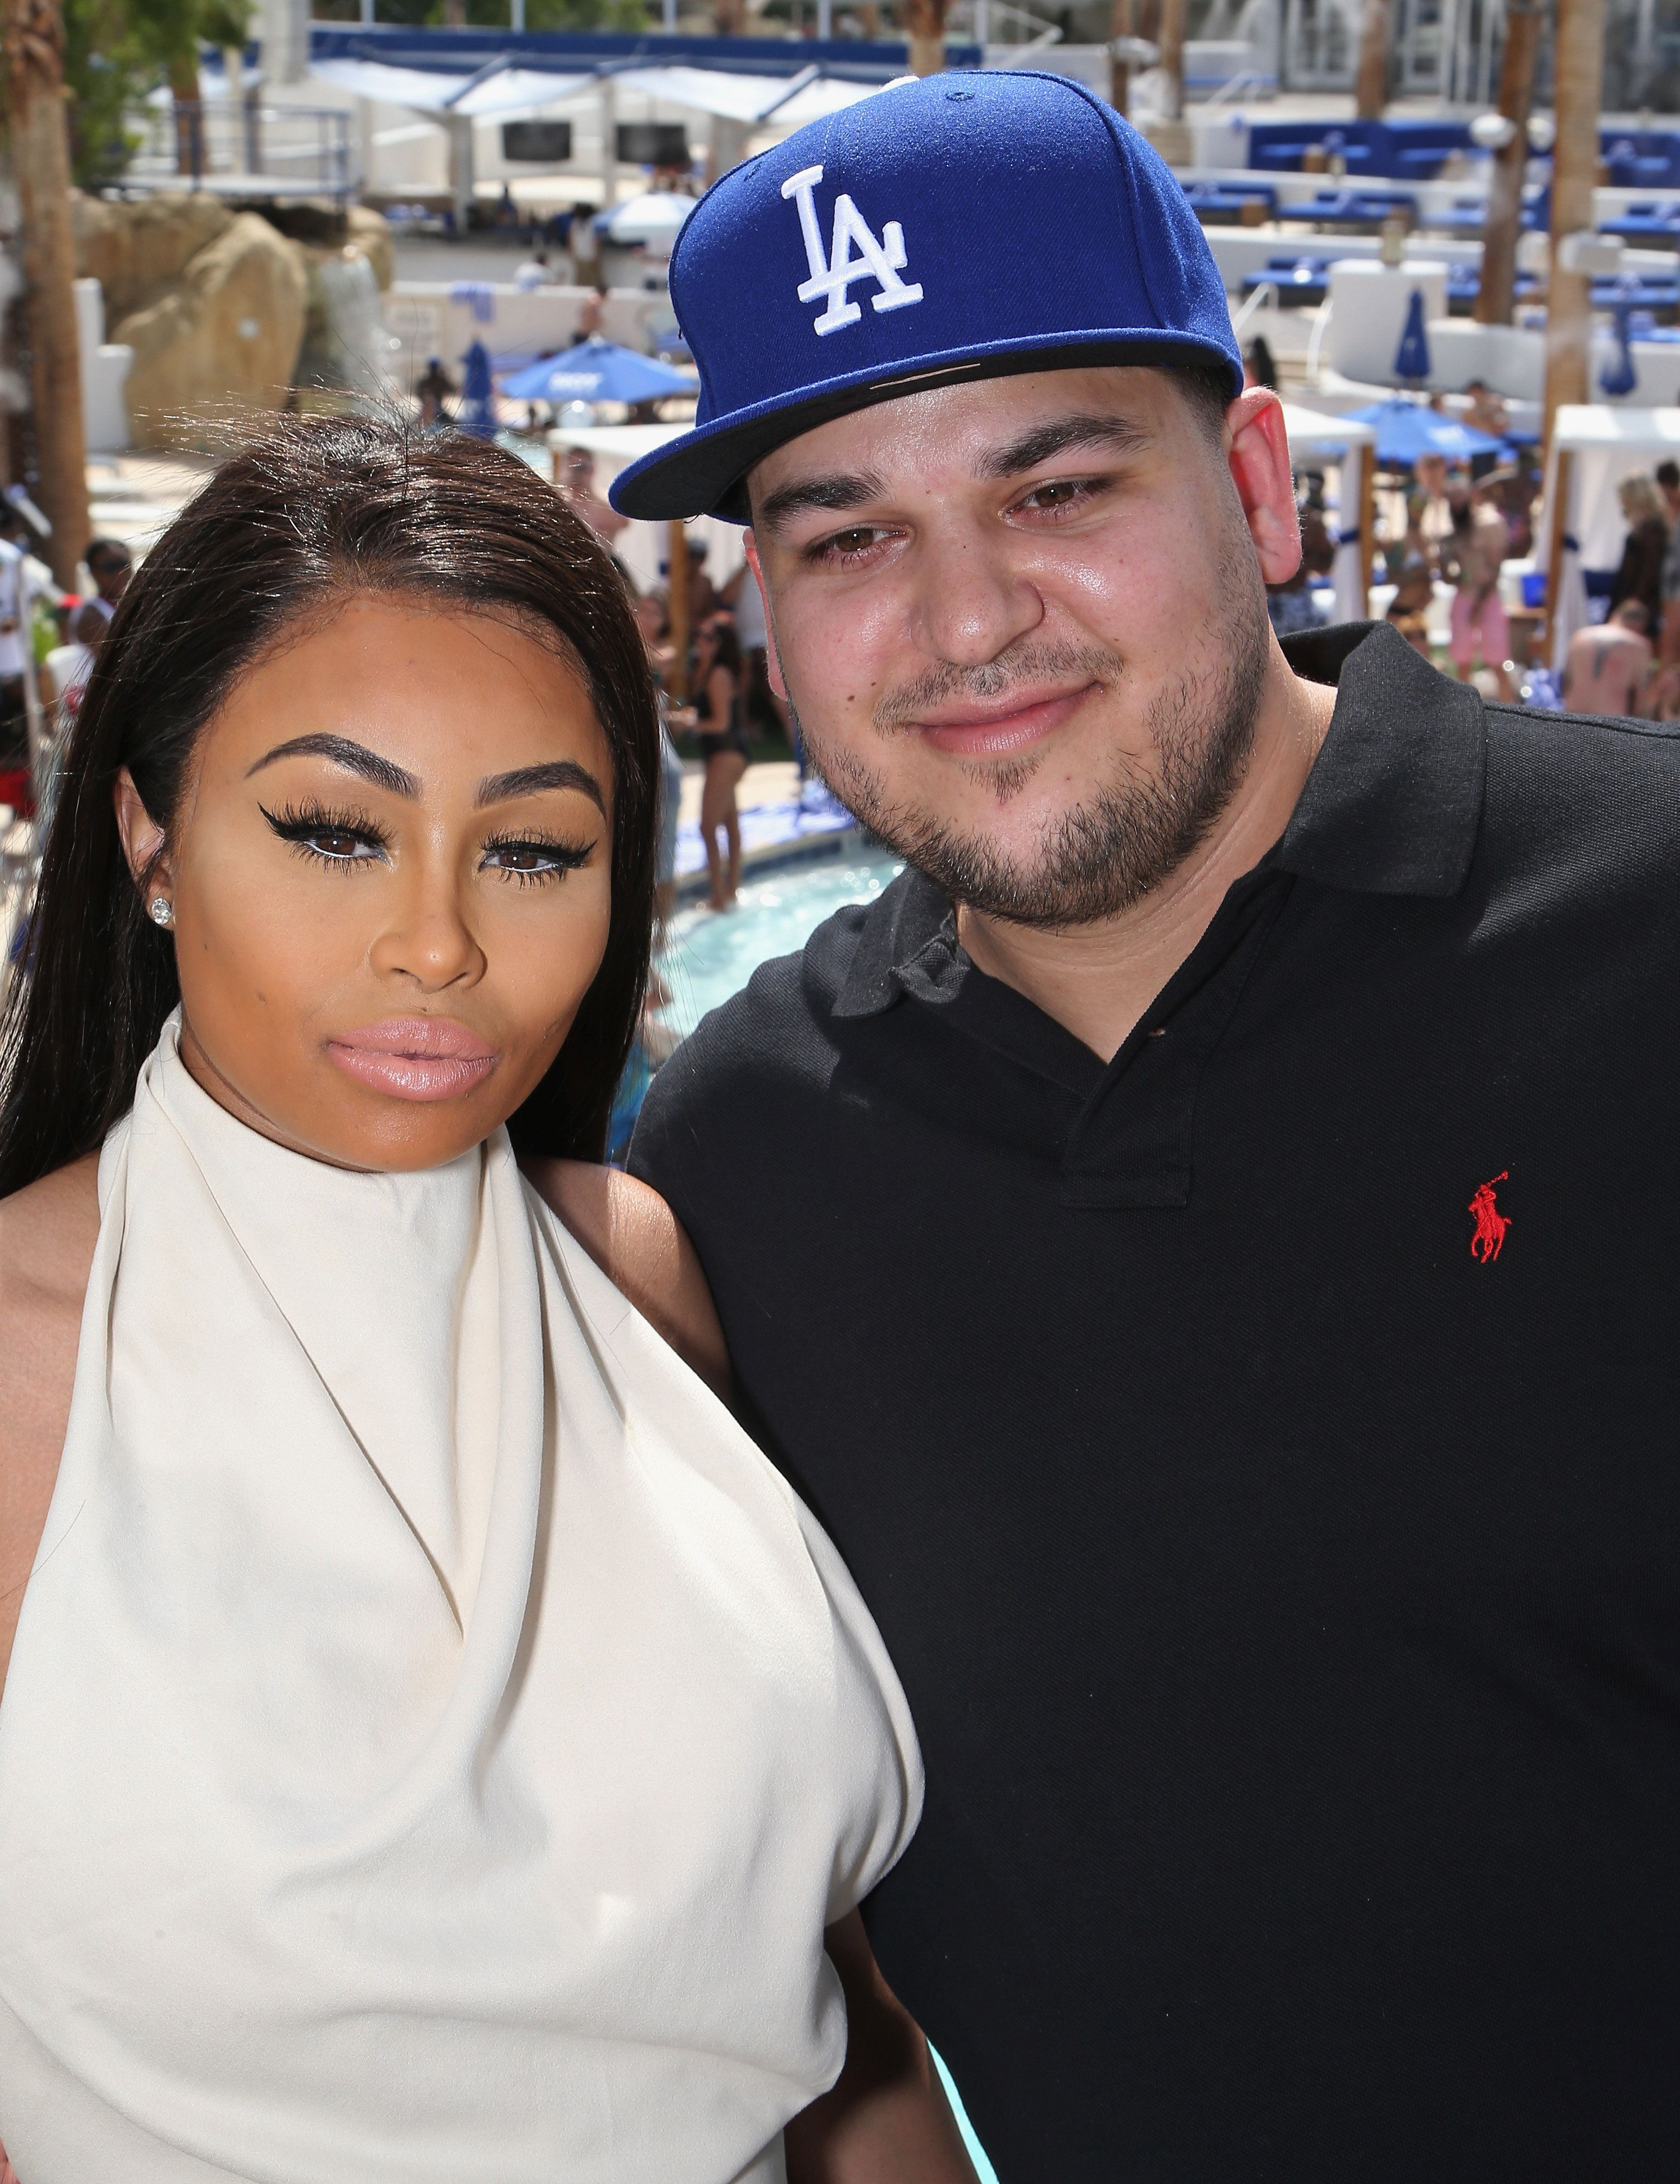 Blac Chyna Seeks Restraining Order Against Rob Kardashian After Revenge